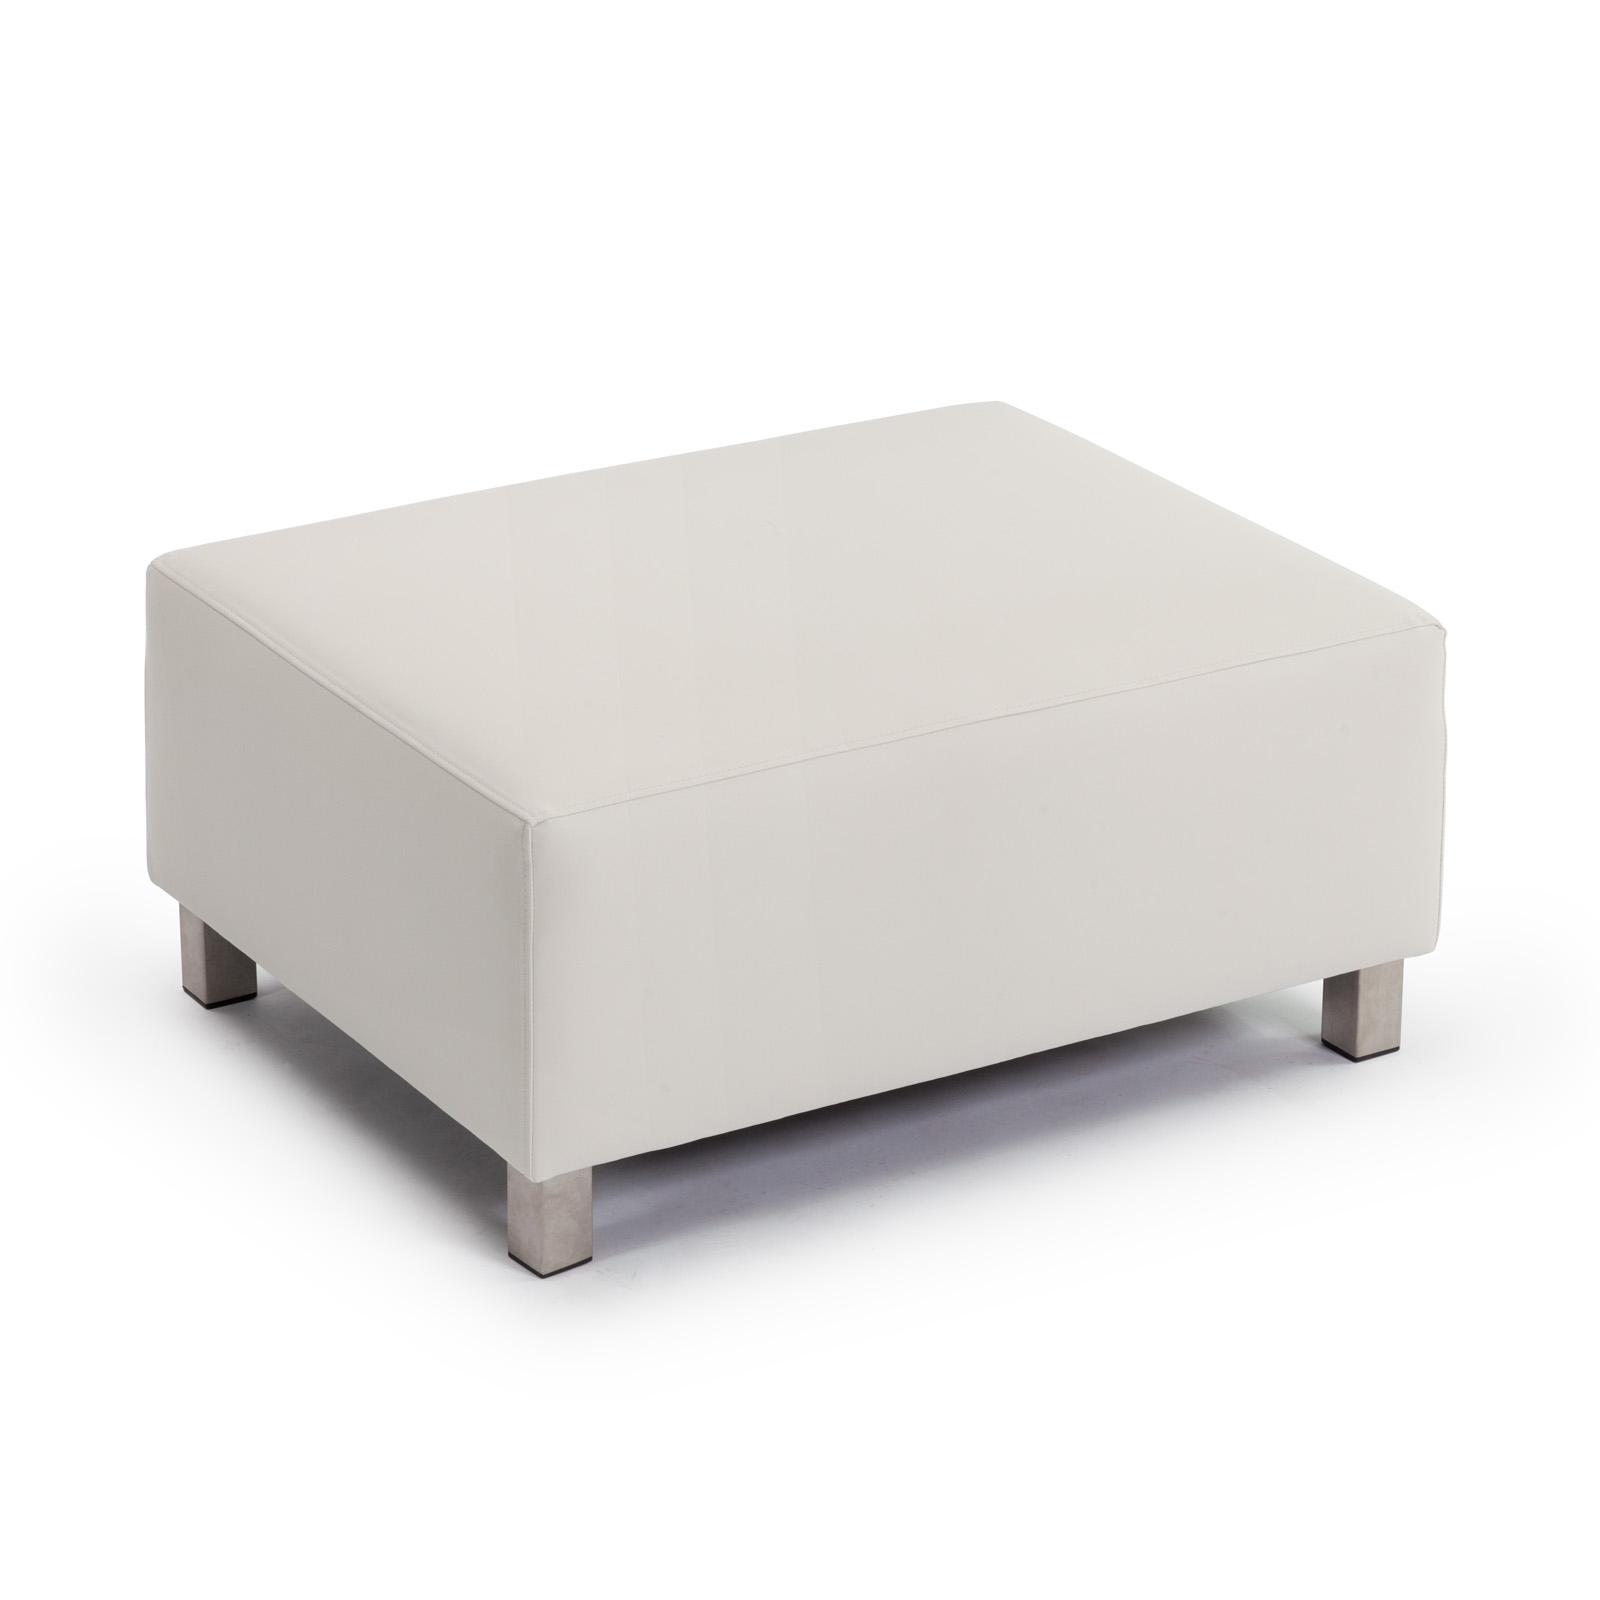 Marbella Beige Hocker (Patio Footstool)